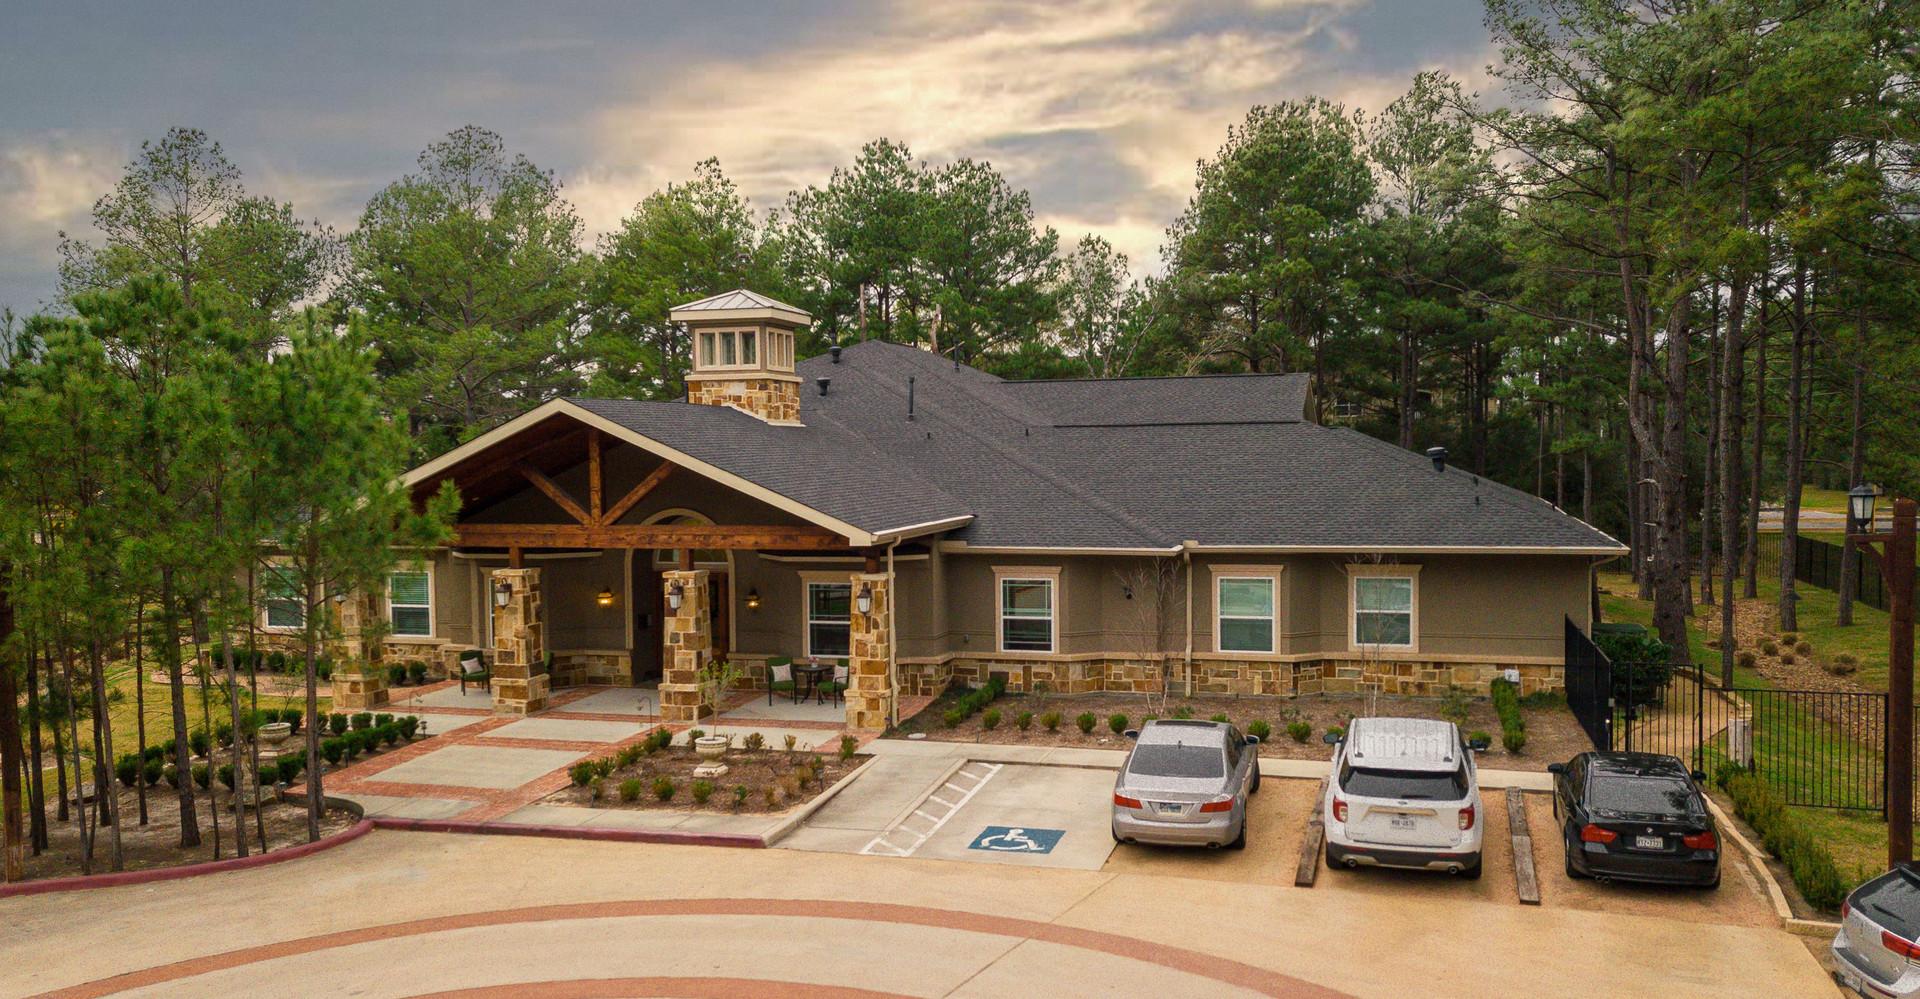 Village Green Alzheimer's Care Home - Cypress